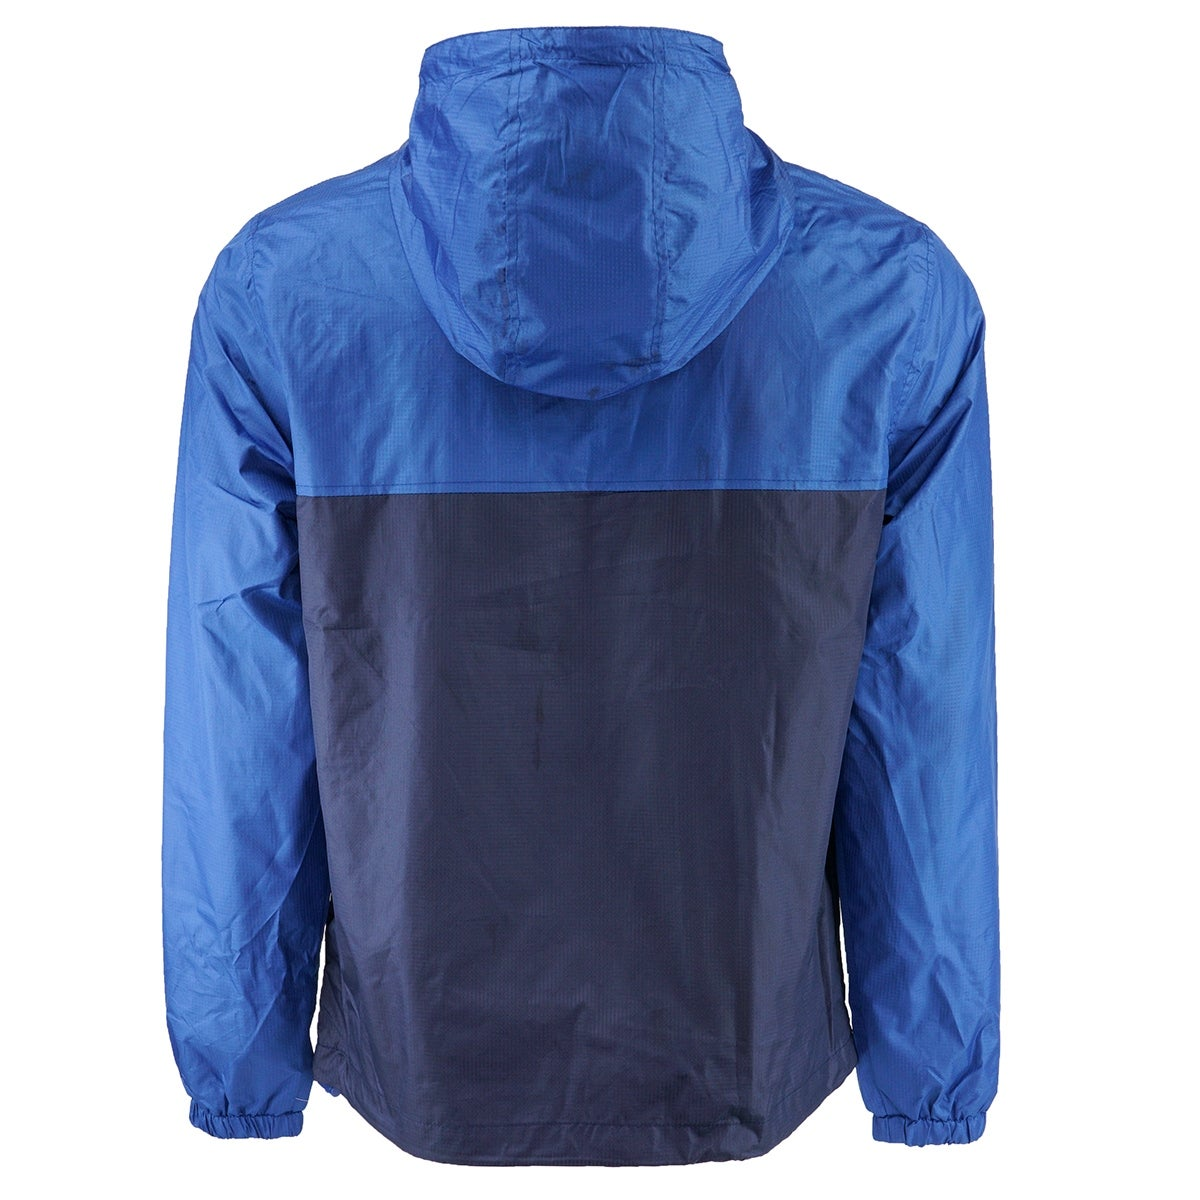 985b4a780b18 Shop Reebok Men s 1 4 Zip 2-Tone Rain Jacket - Team Royal Navy - Free  Shipping Today - Overstock - 26517929